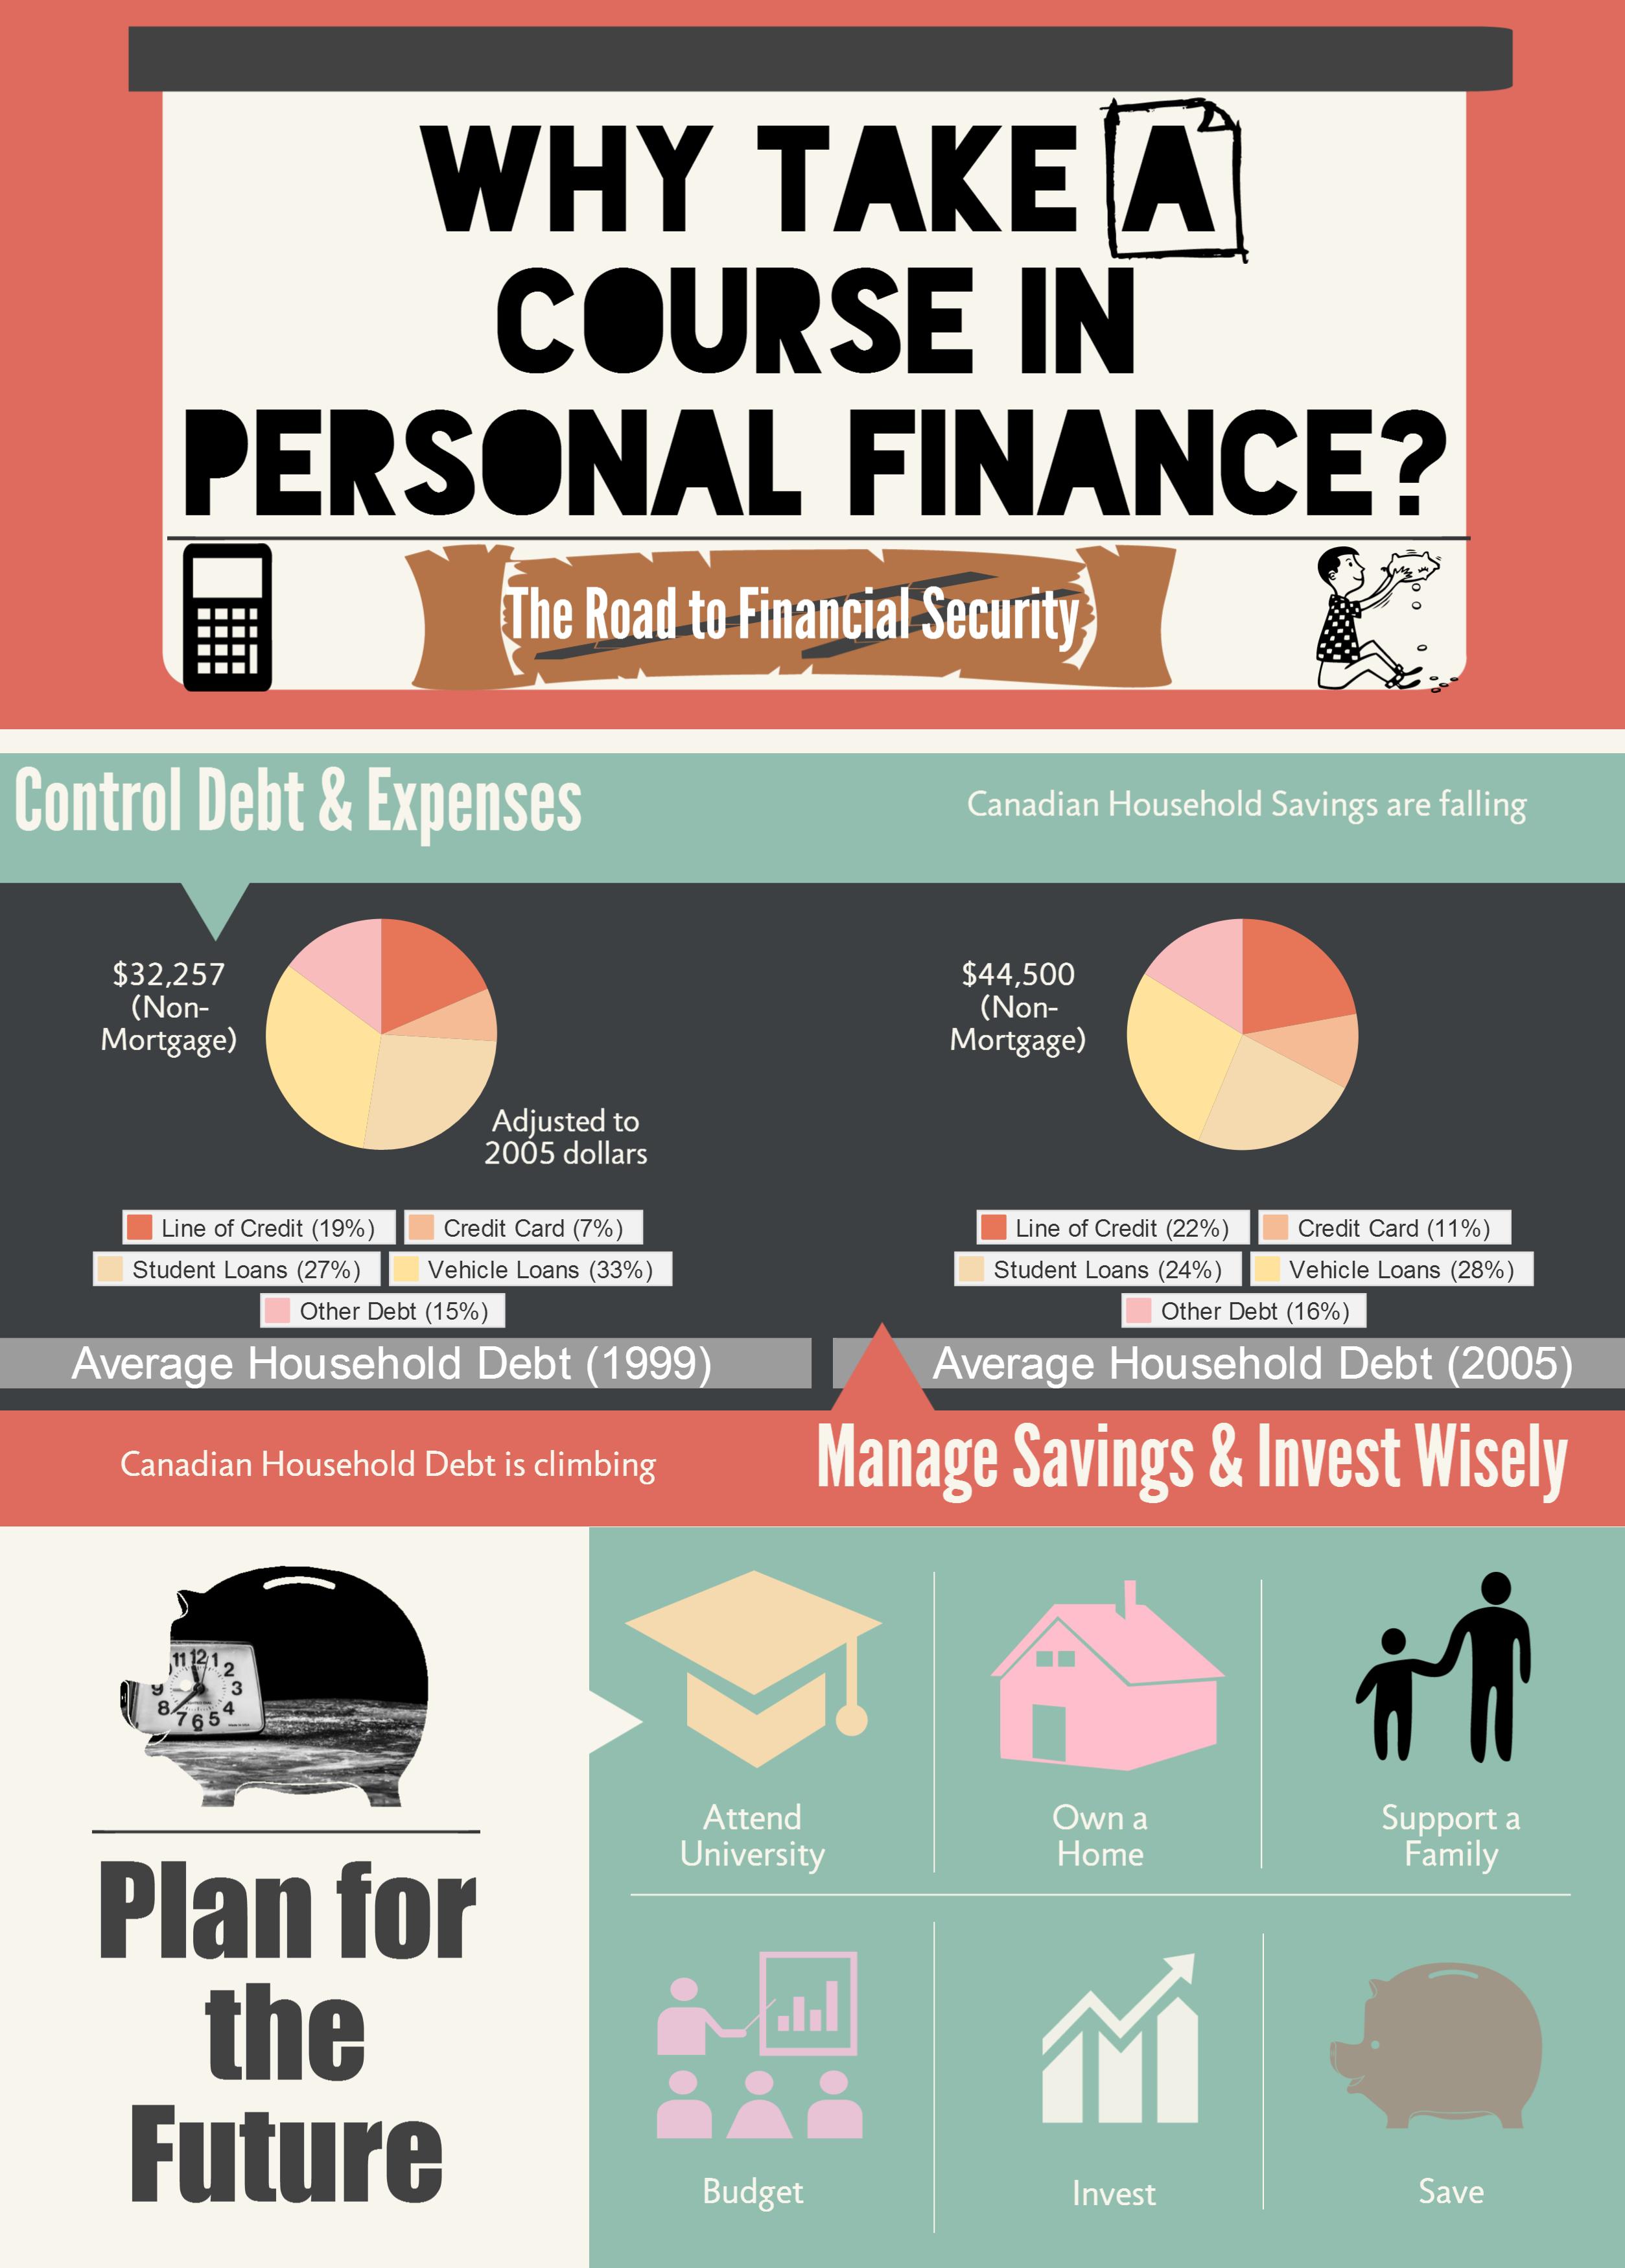 [DOC]personal finance case studies - ndclpersonalfinance